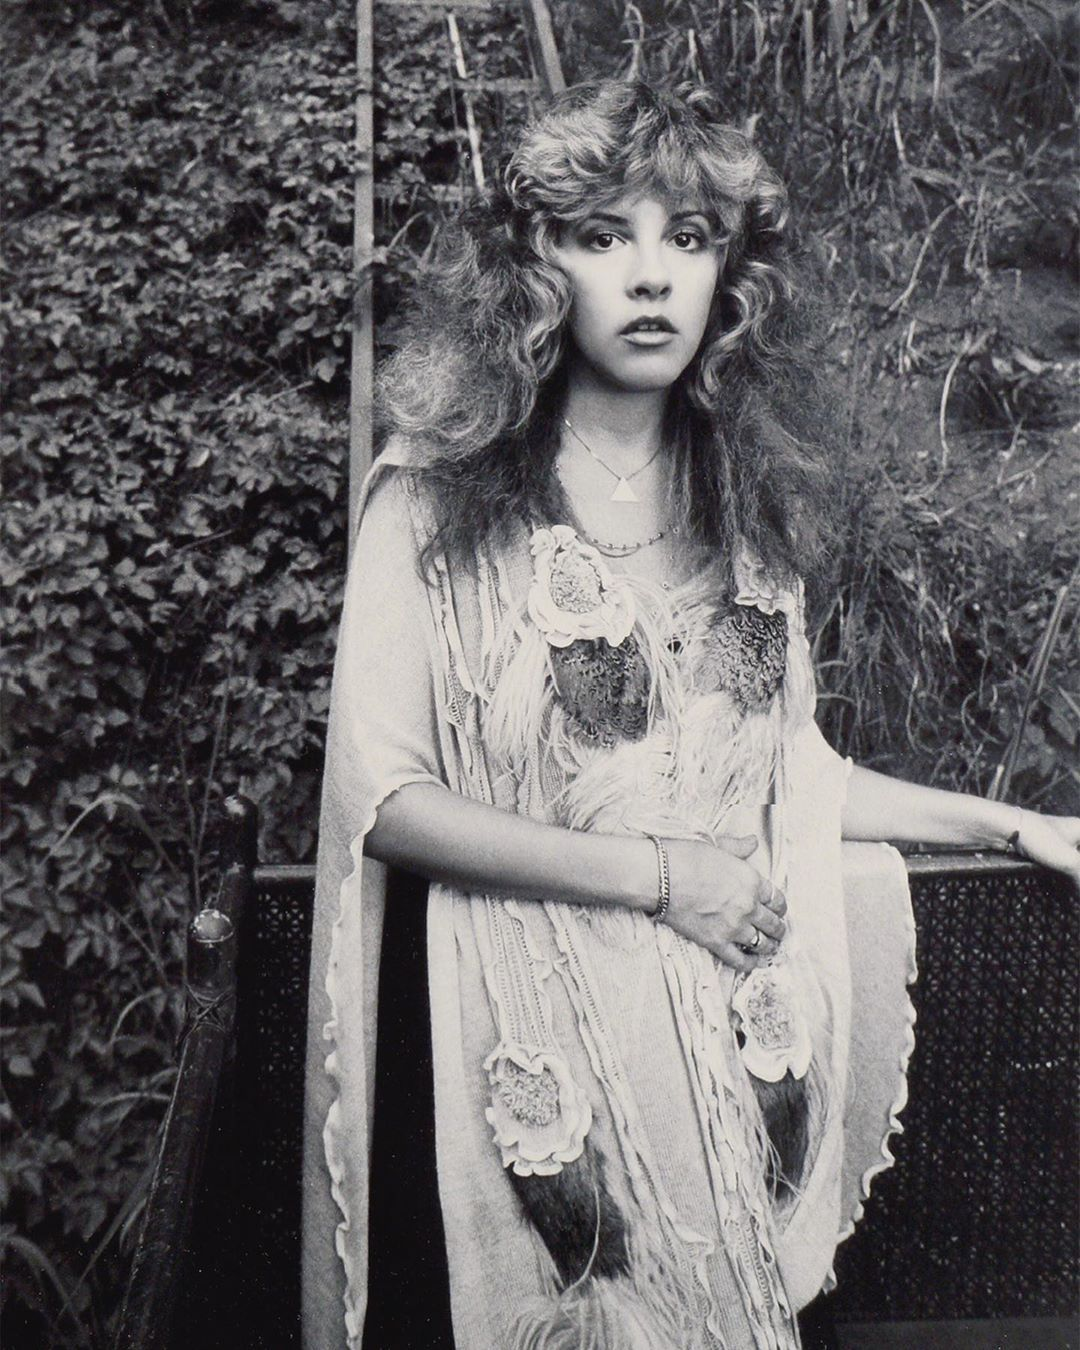 Stevie Nicks - Laurel Canyon, 1981 // Photo by Neal Preston ✨